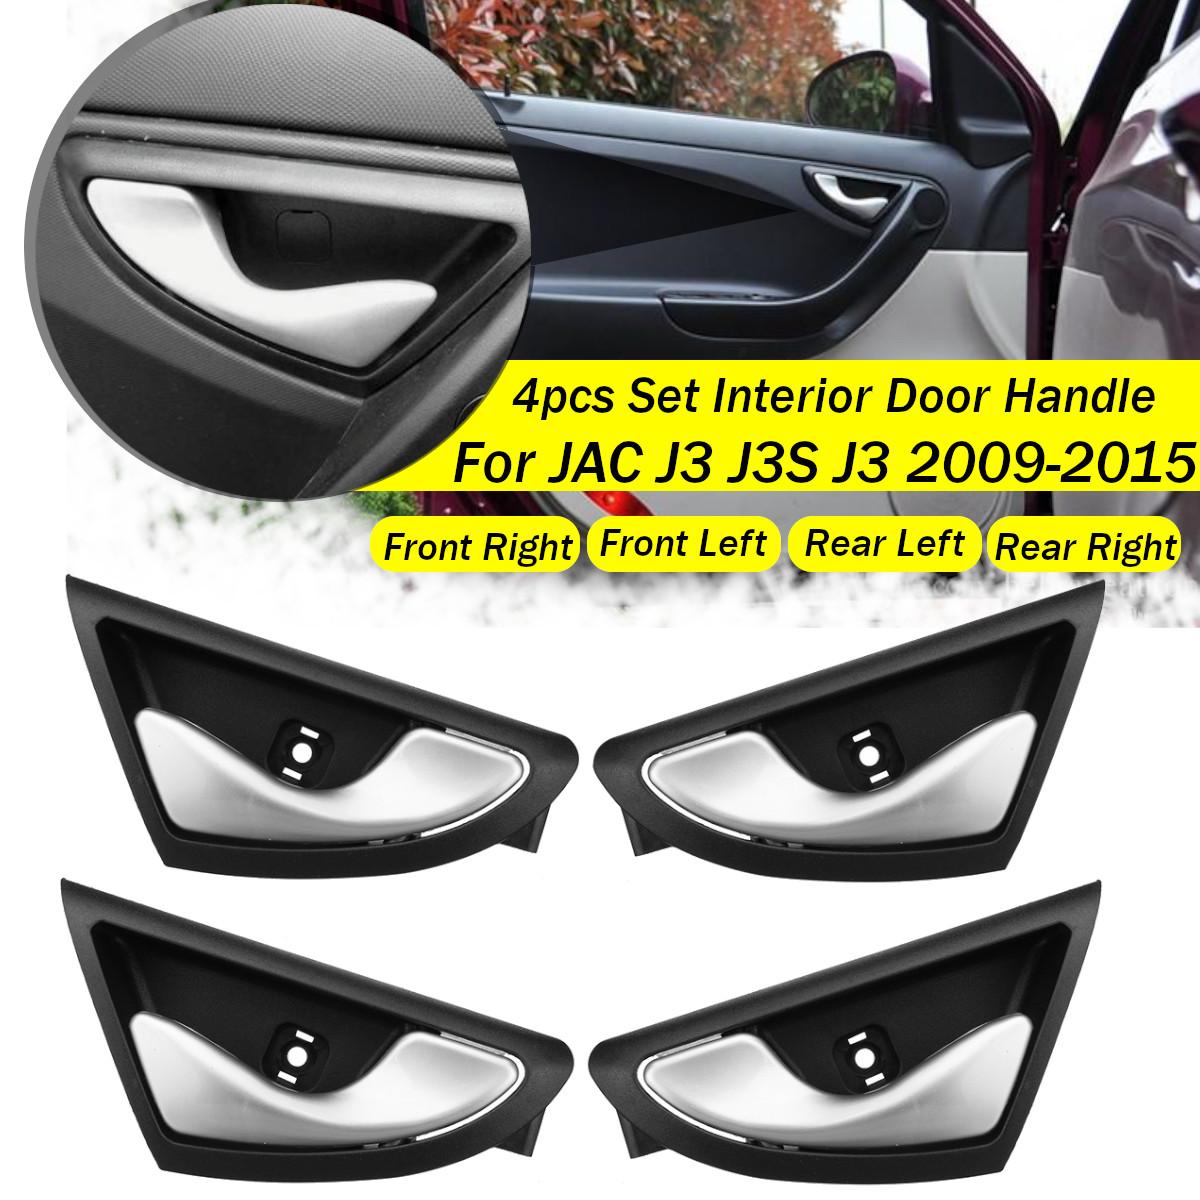 4Pcs Car Interior Inner Door Handle Handles Knob Open 6105230u8010 For JAC J3 J3S J3 Turin 2009 2010 2011 2012 2013 2014 2015